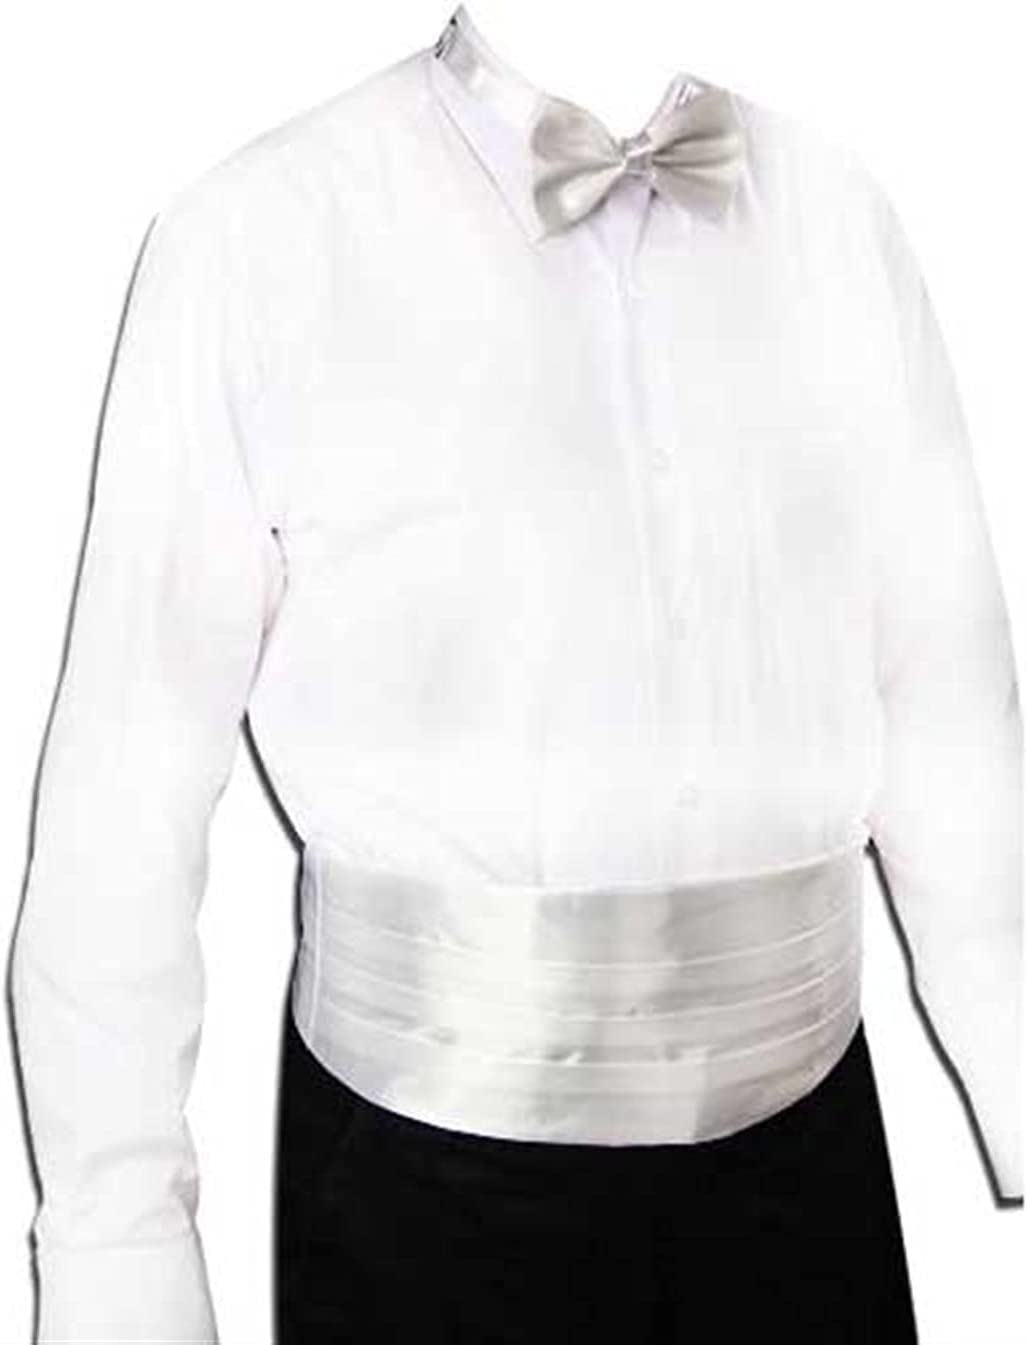 JJZXC Gentleman Solid Wide Silk Satin Elastic Belly Band Tuxedo Cummerbund Commercial Banquet Model Business Elite (Color : B)